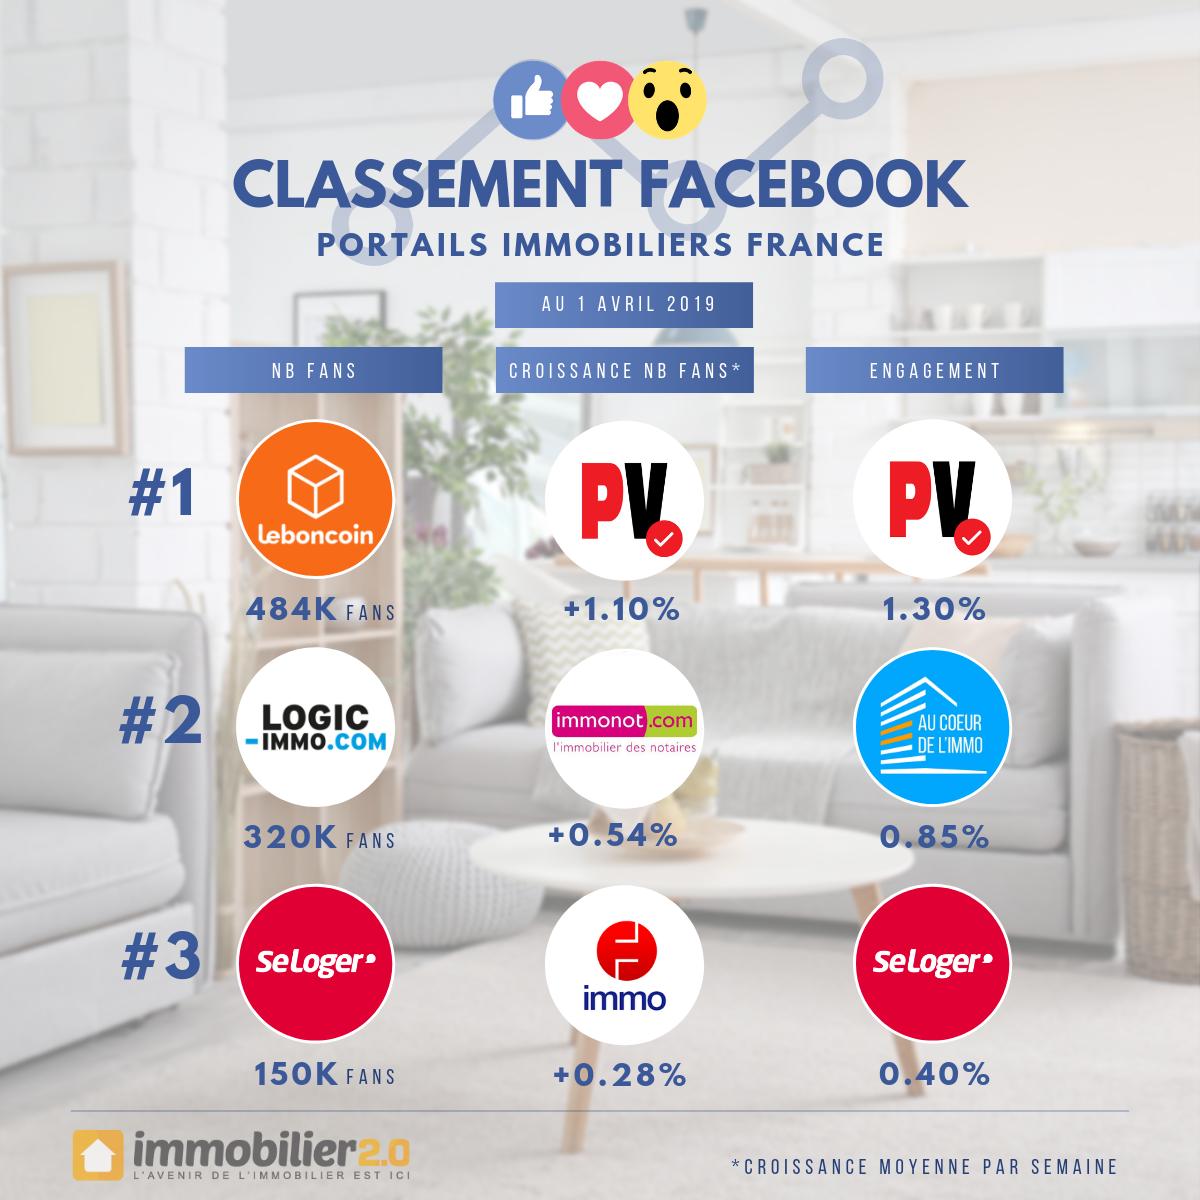 Classement Facebook Portails Immobiliers France Avril 2019